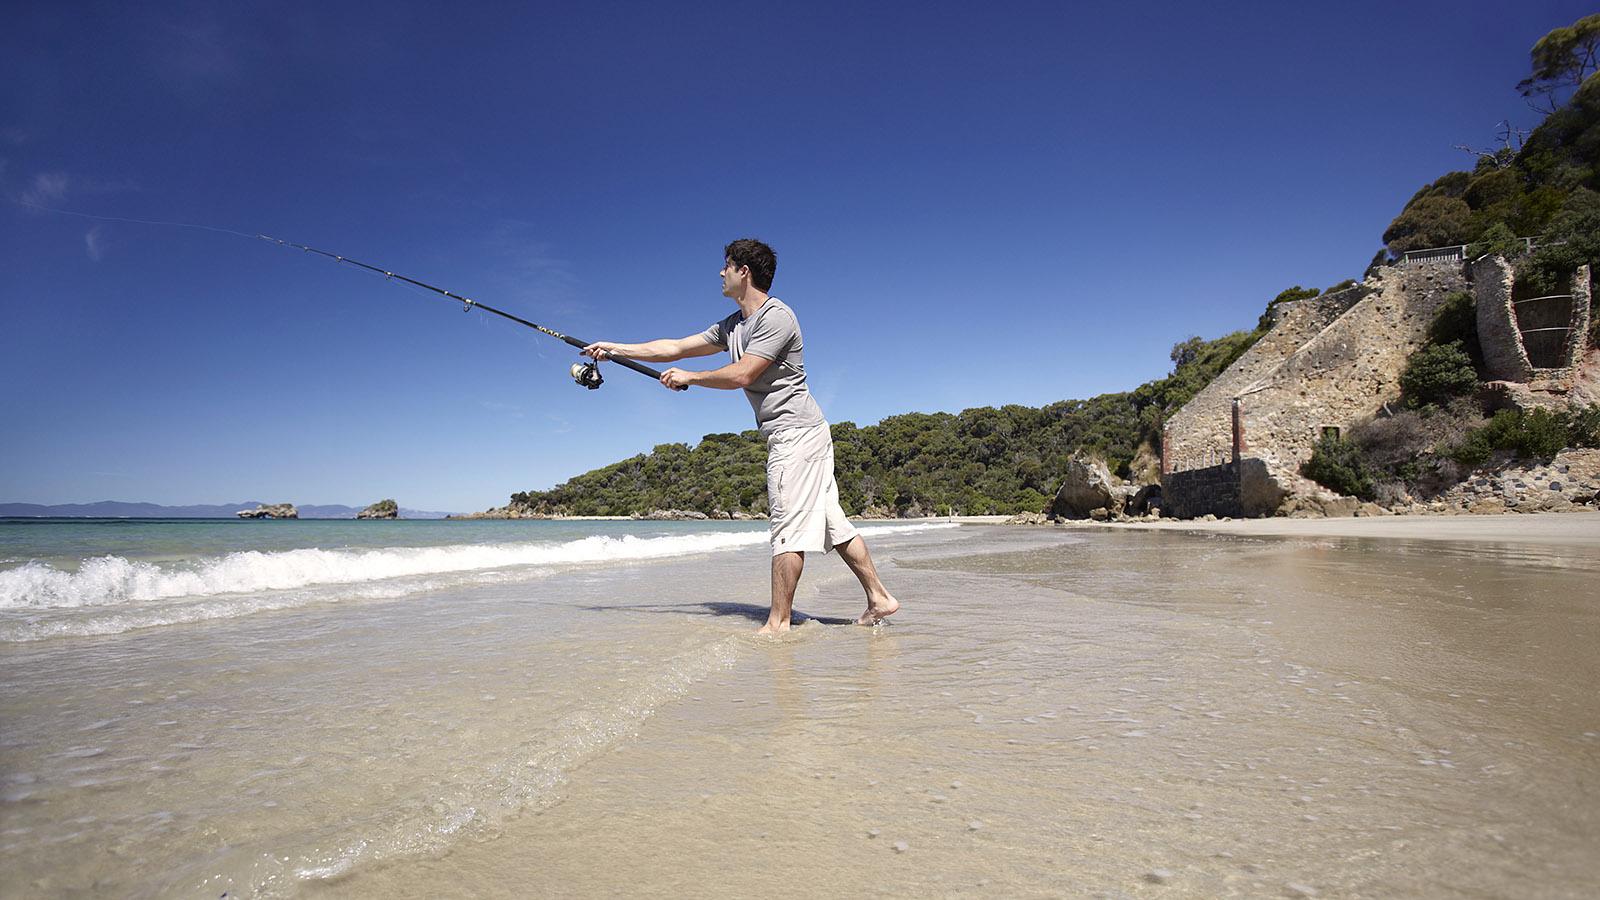 Fishing at Walkerville, Gippsland, Victoria, Australia